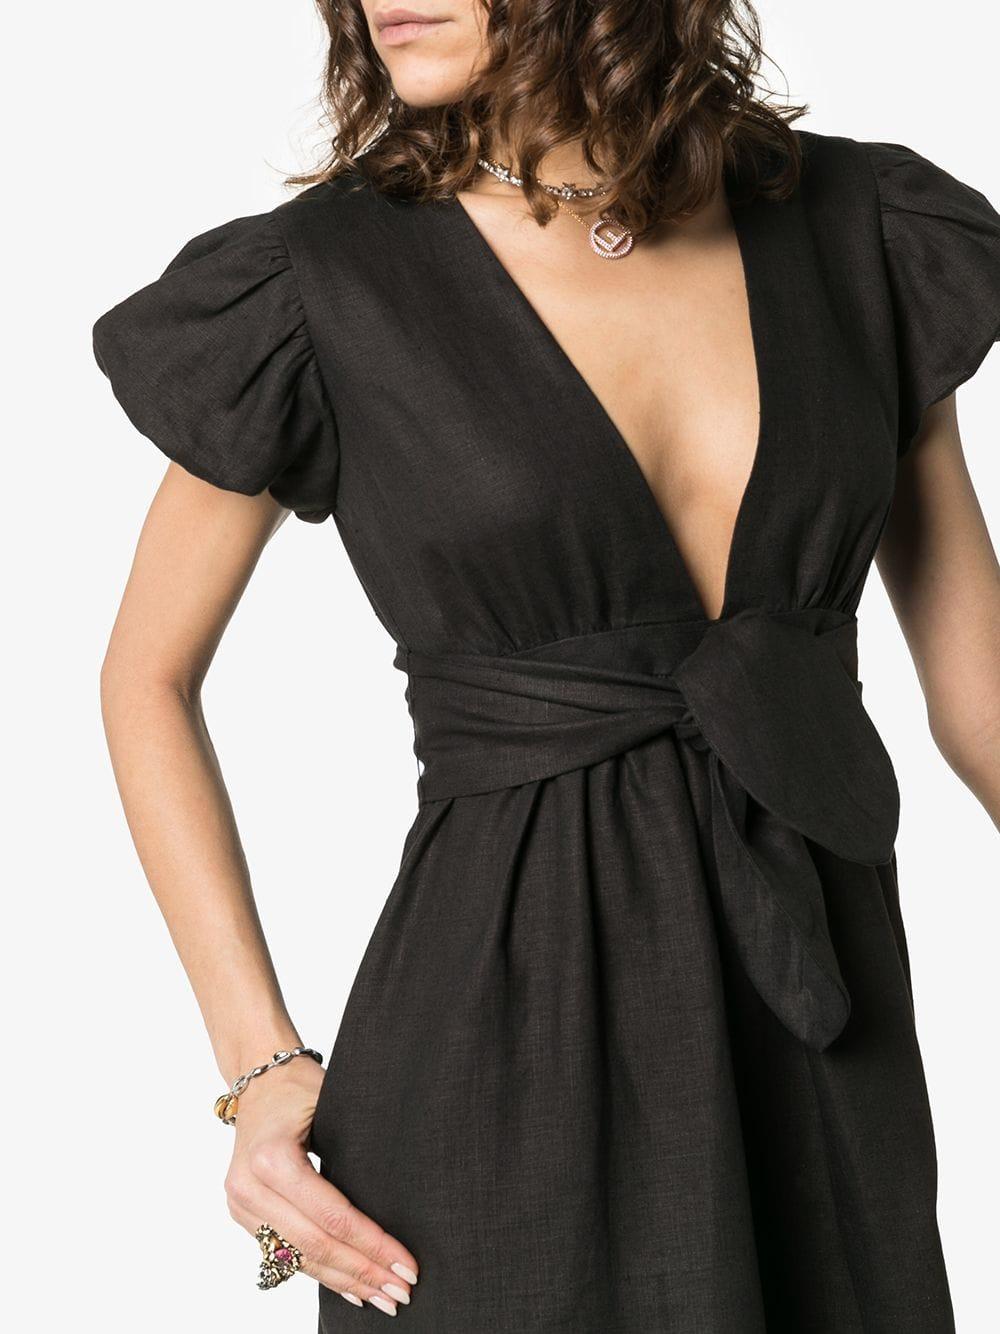 MARA HOFFMAN Savannah Bow Detail Midi Black Dress